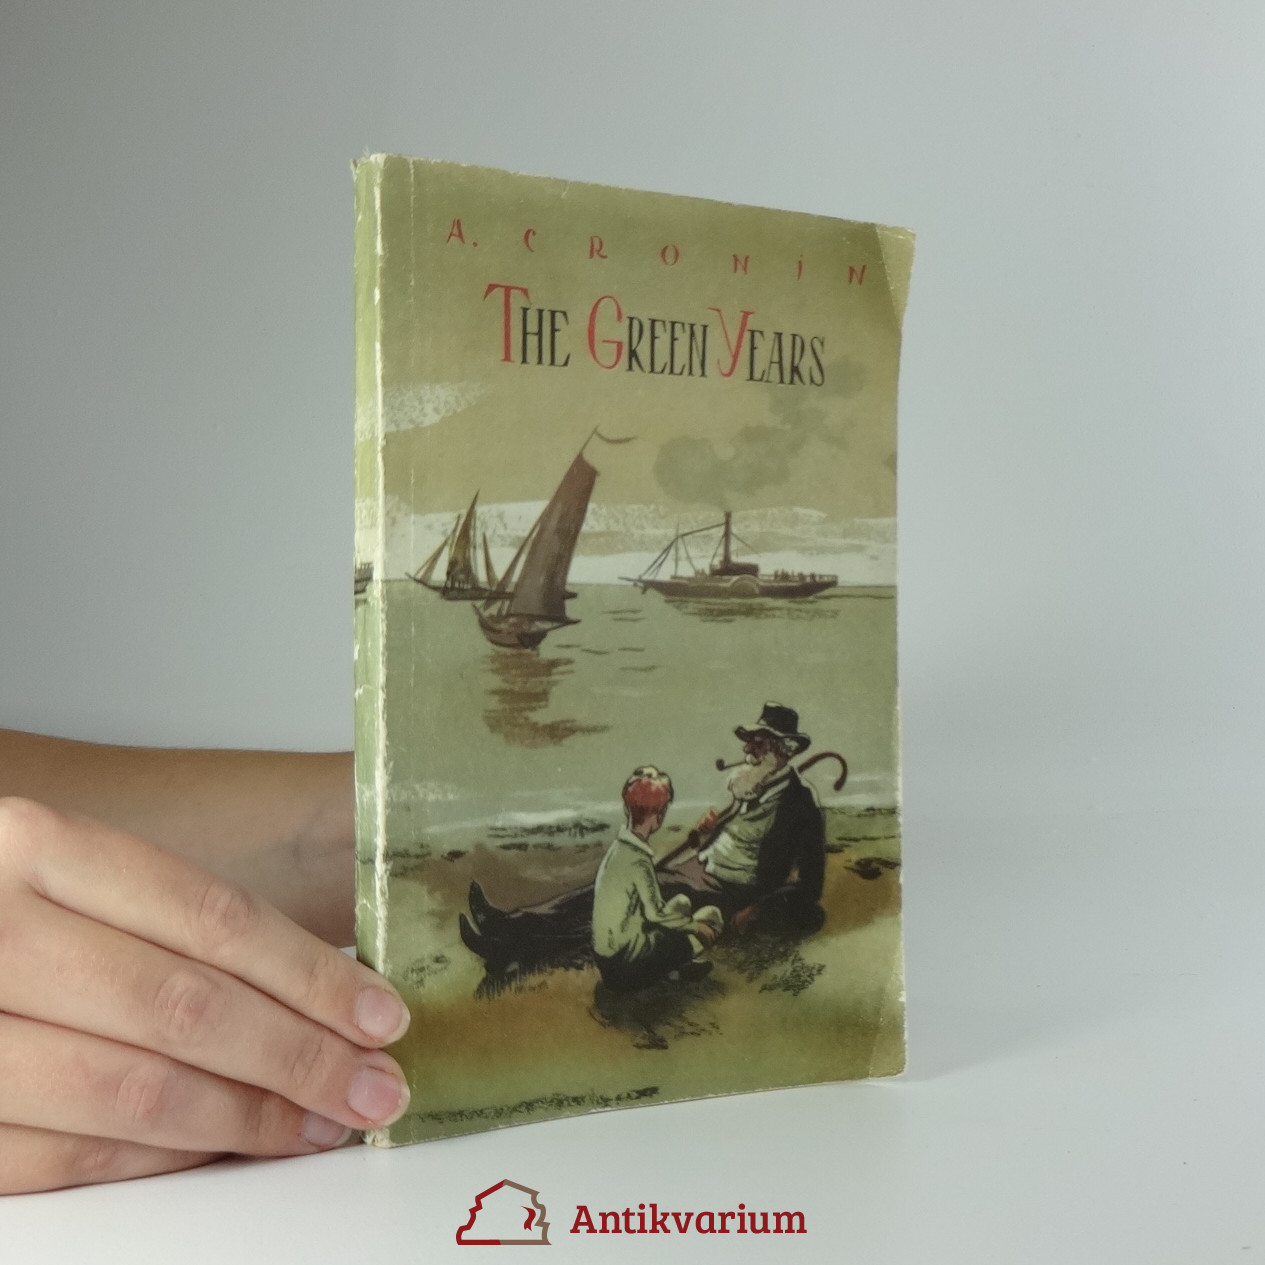 antikvární kniha The green years, 1959